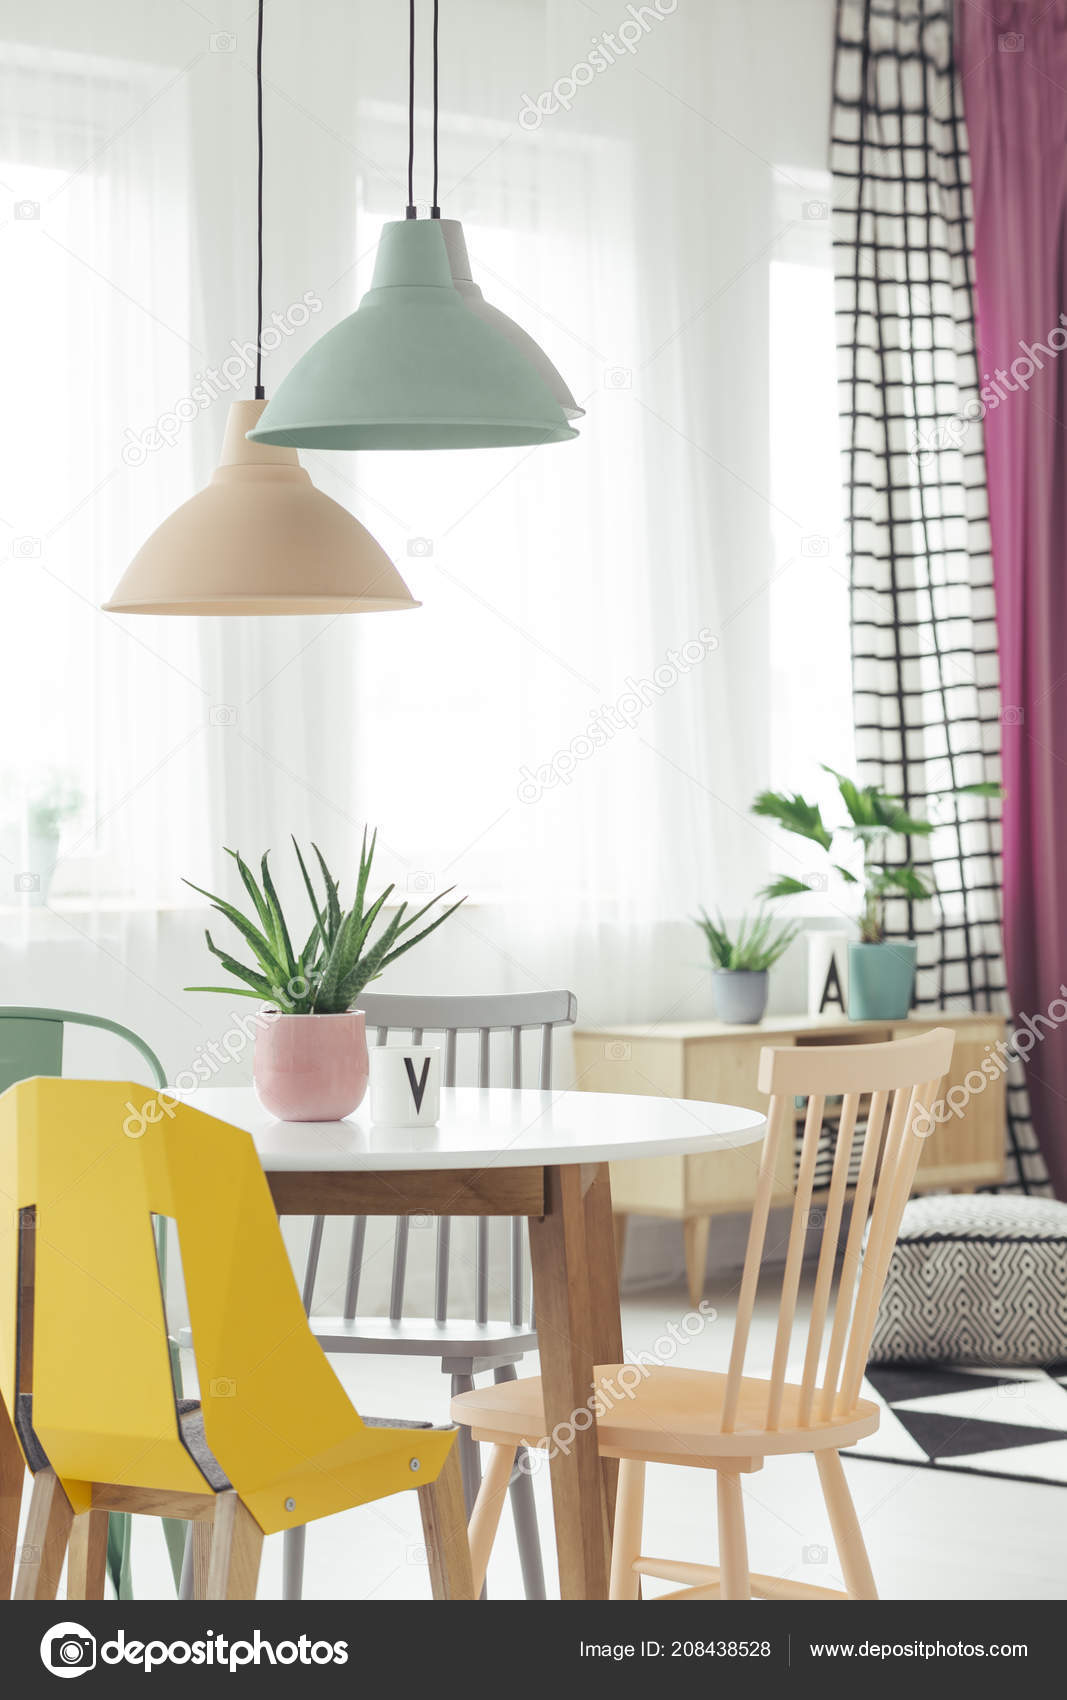 Lampade Sopra Tavolo Da Pranzo real photo pastel lamps hanging wooden dining table fresh